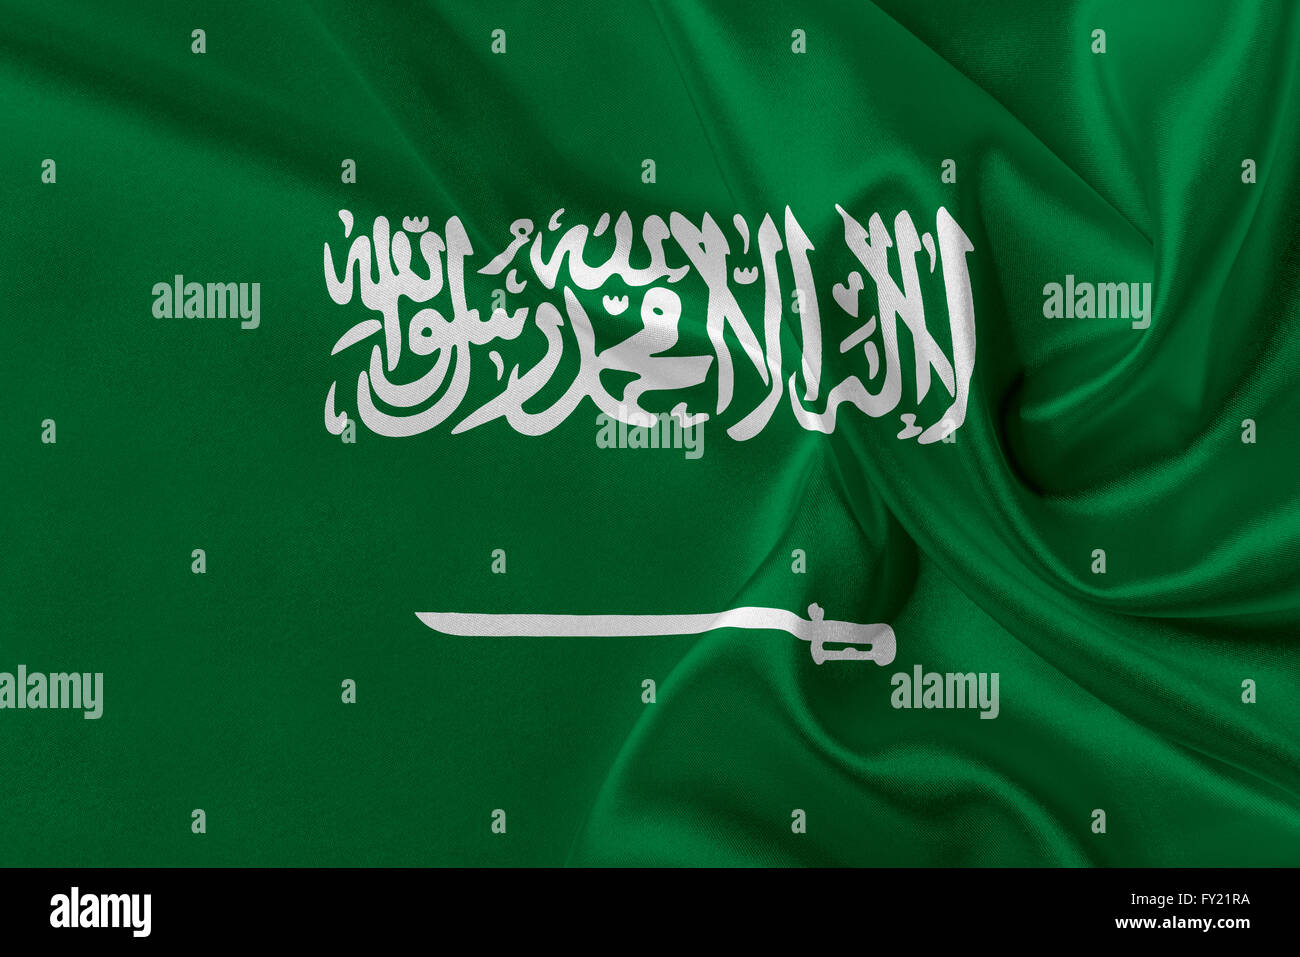 Flag of Saudi Arabia waving in the wind. - Stock Image